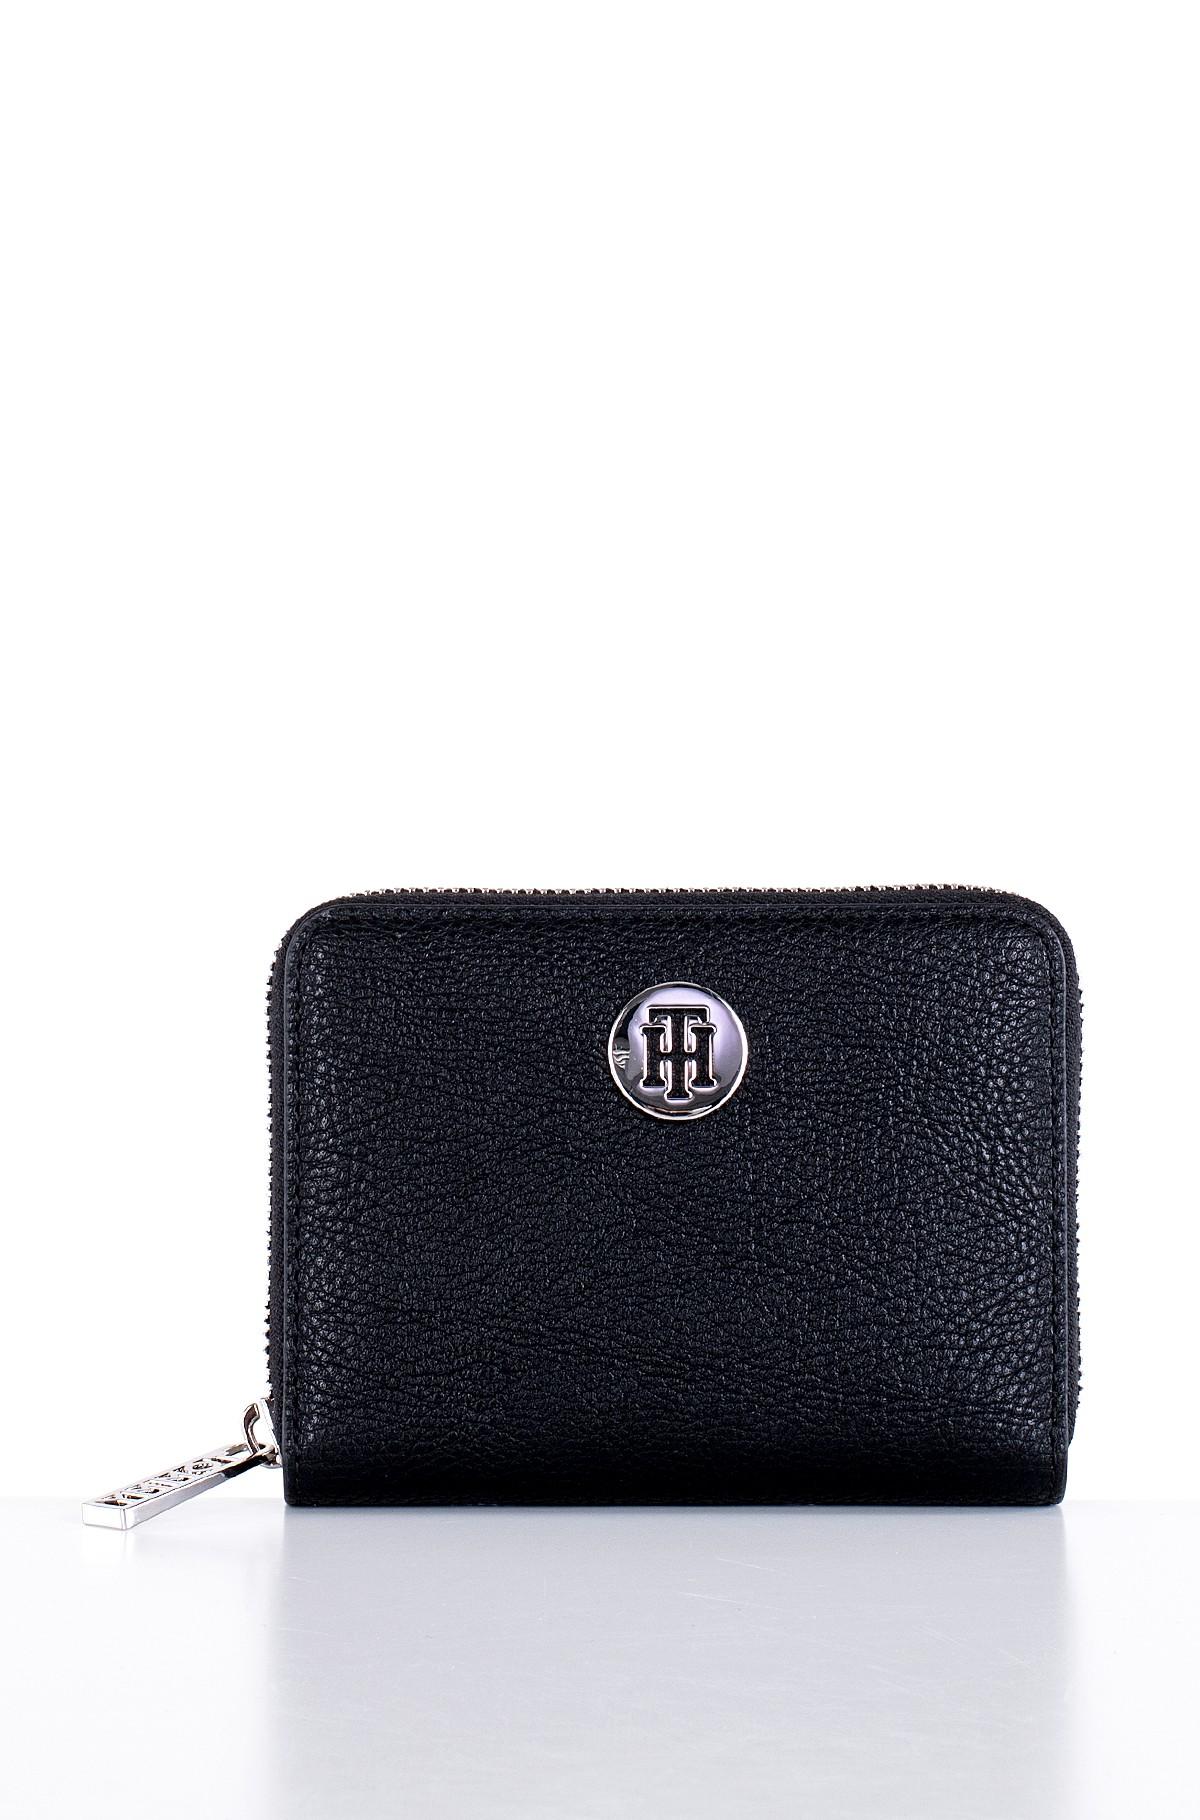 Wallet TH CORE MEDIUM ZA-full-1